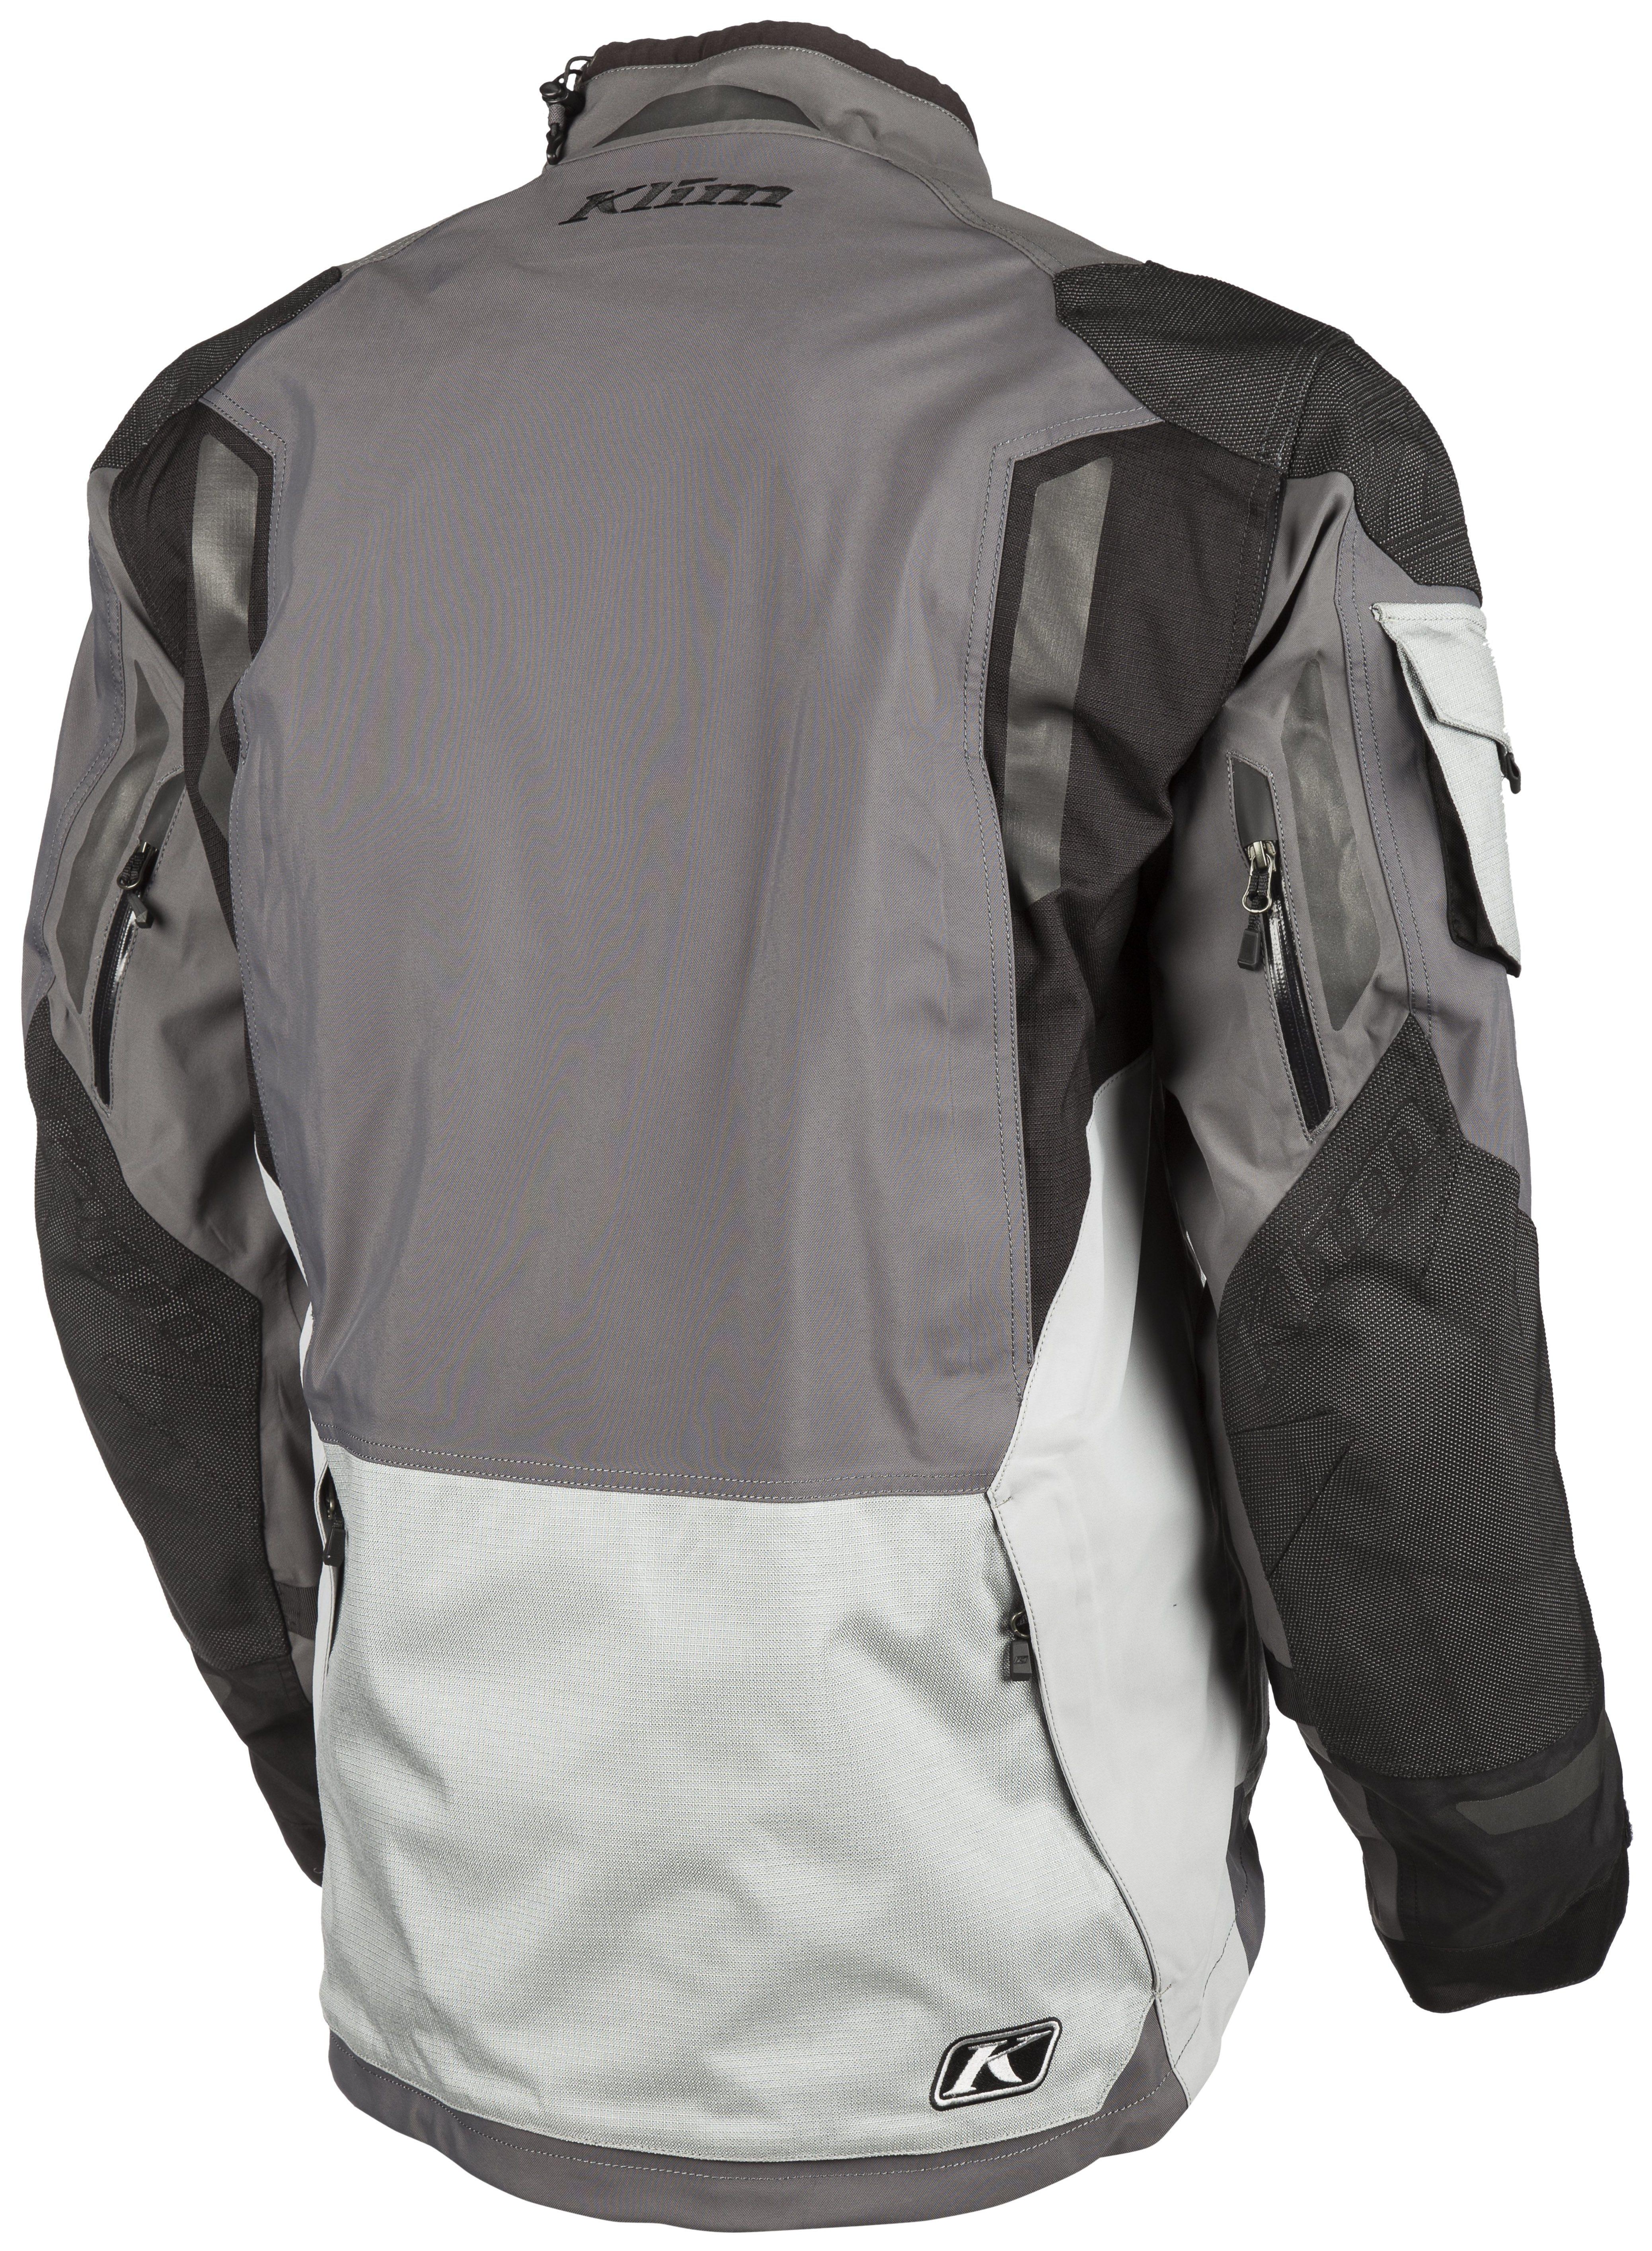 Klim Badlands Pro Jacket Revzilla Tendencies Get Lost Pocket Keychain Black